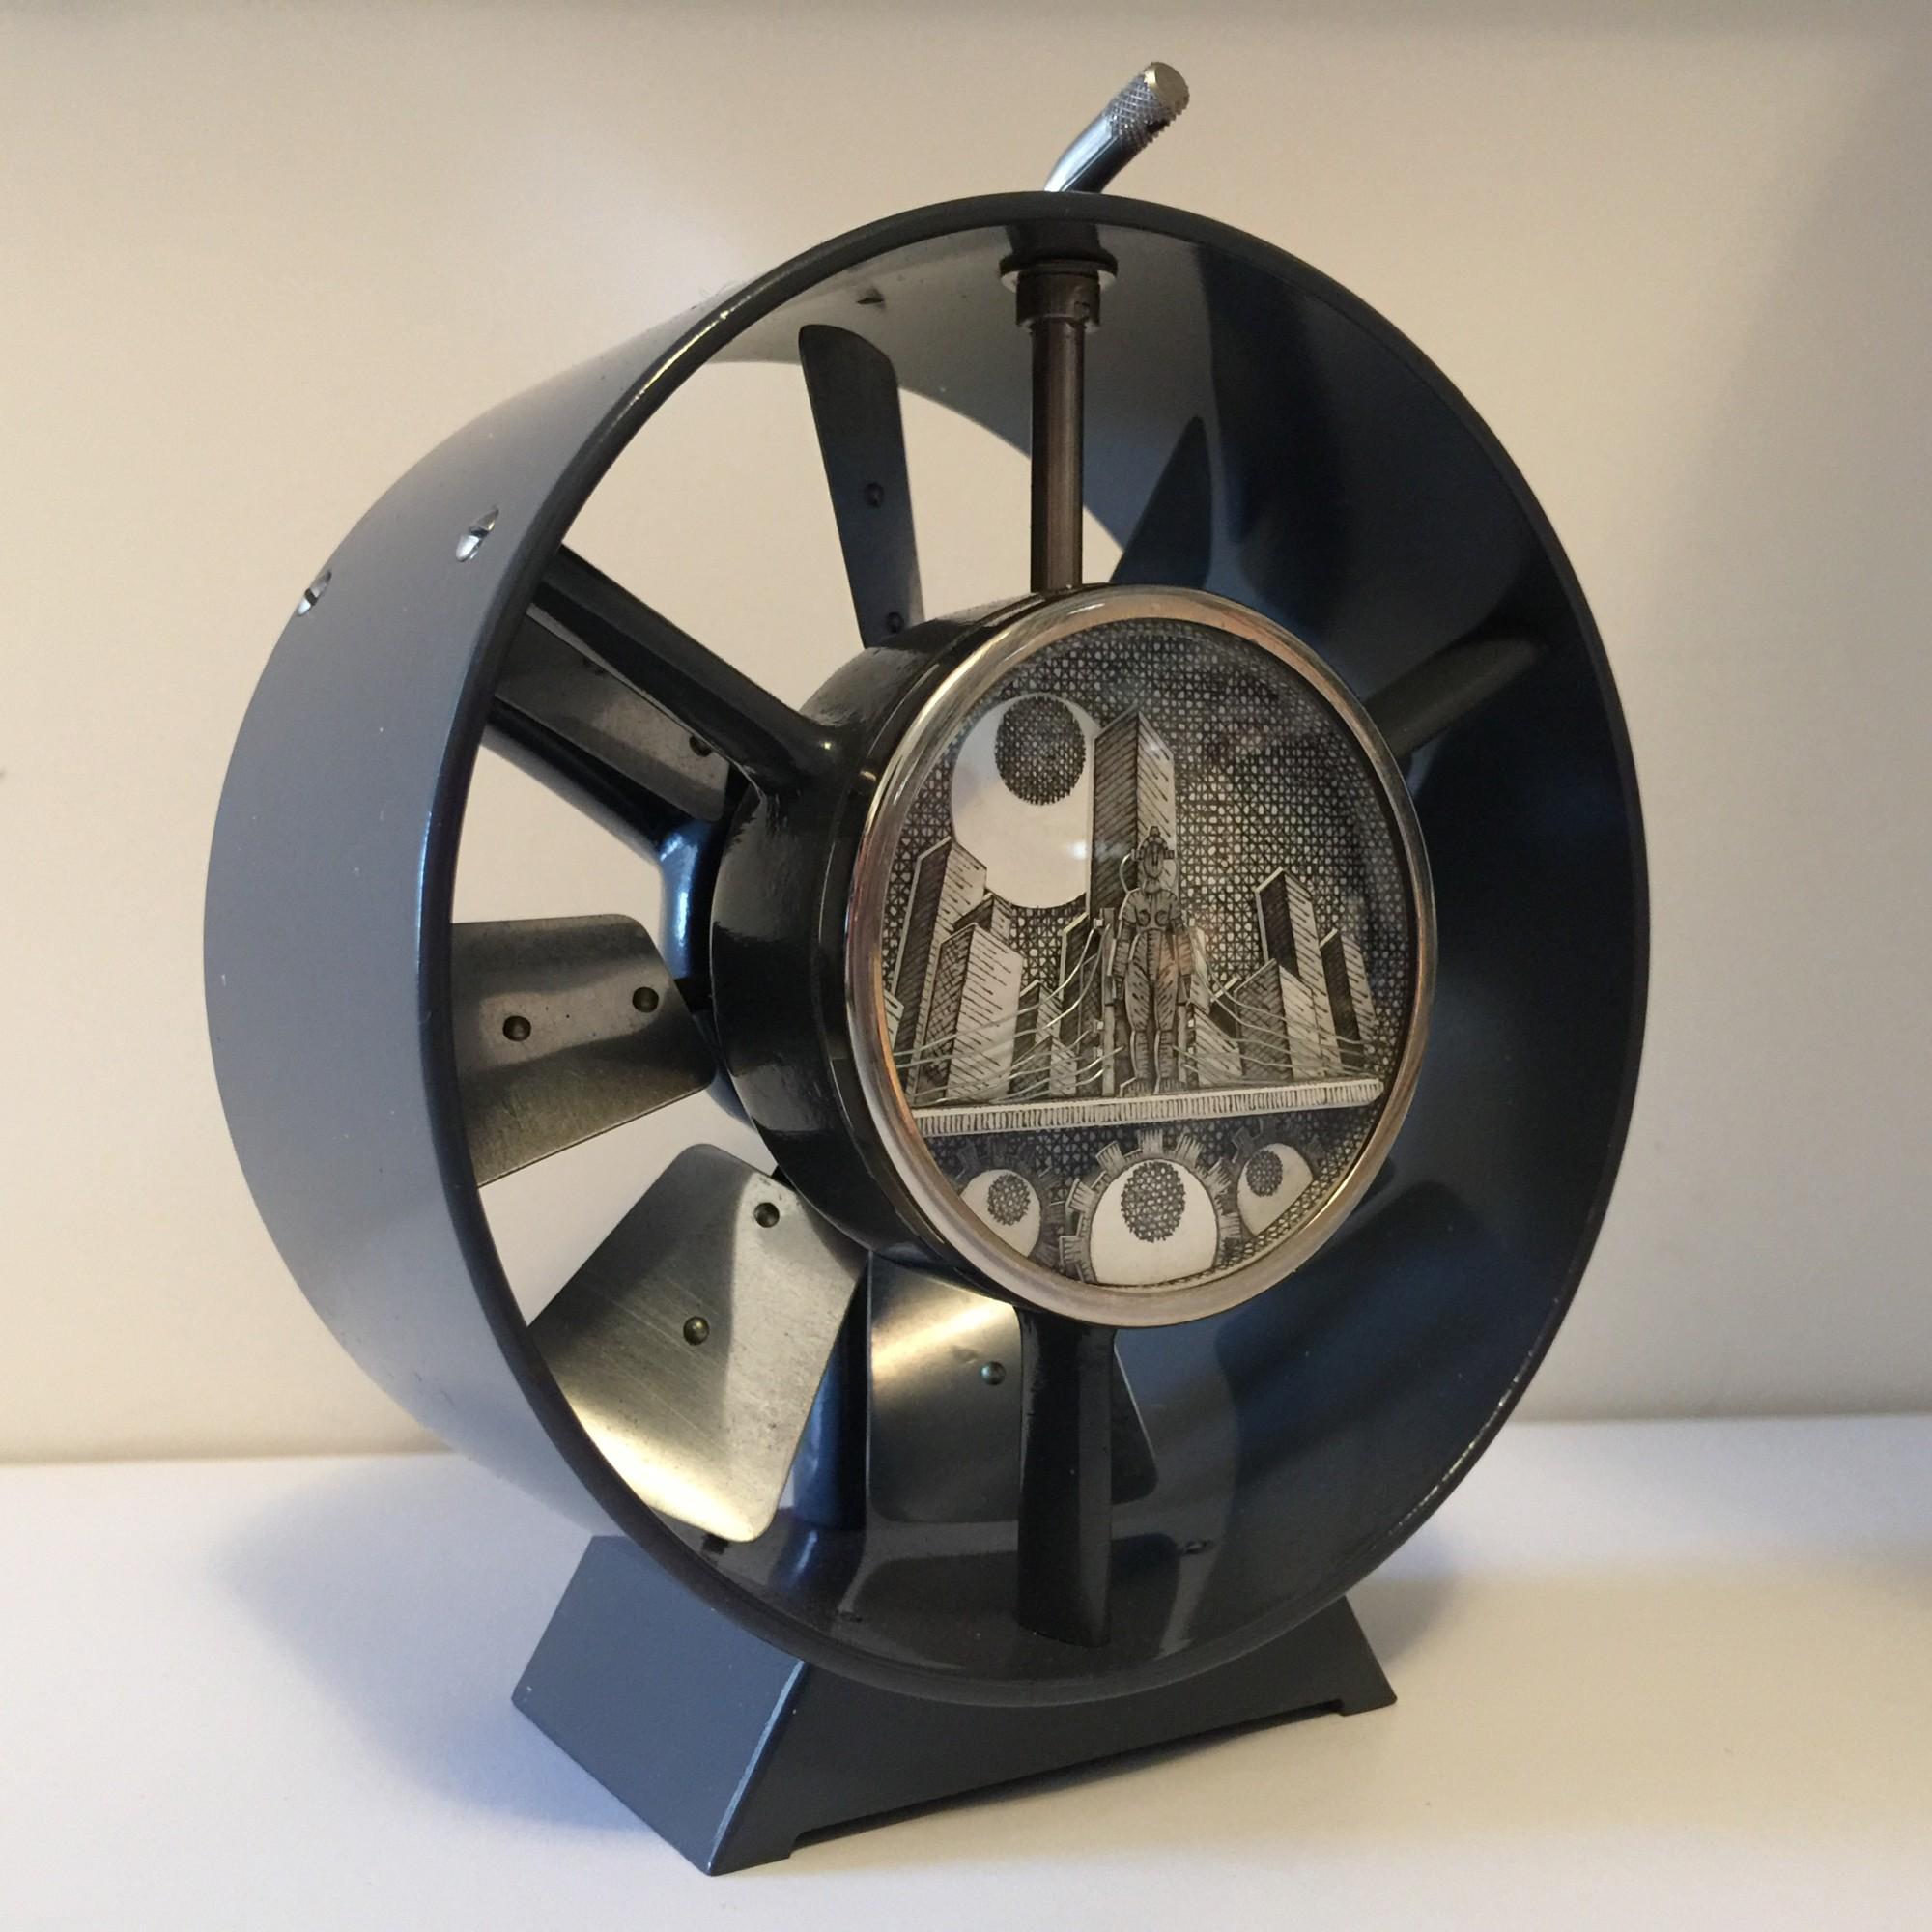 Matthew-Pleva-Miniature-Paper-Diorama-Metropolis-Strictlypaper-3